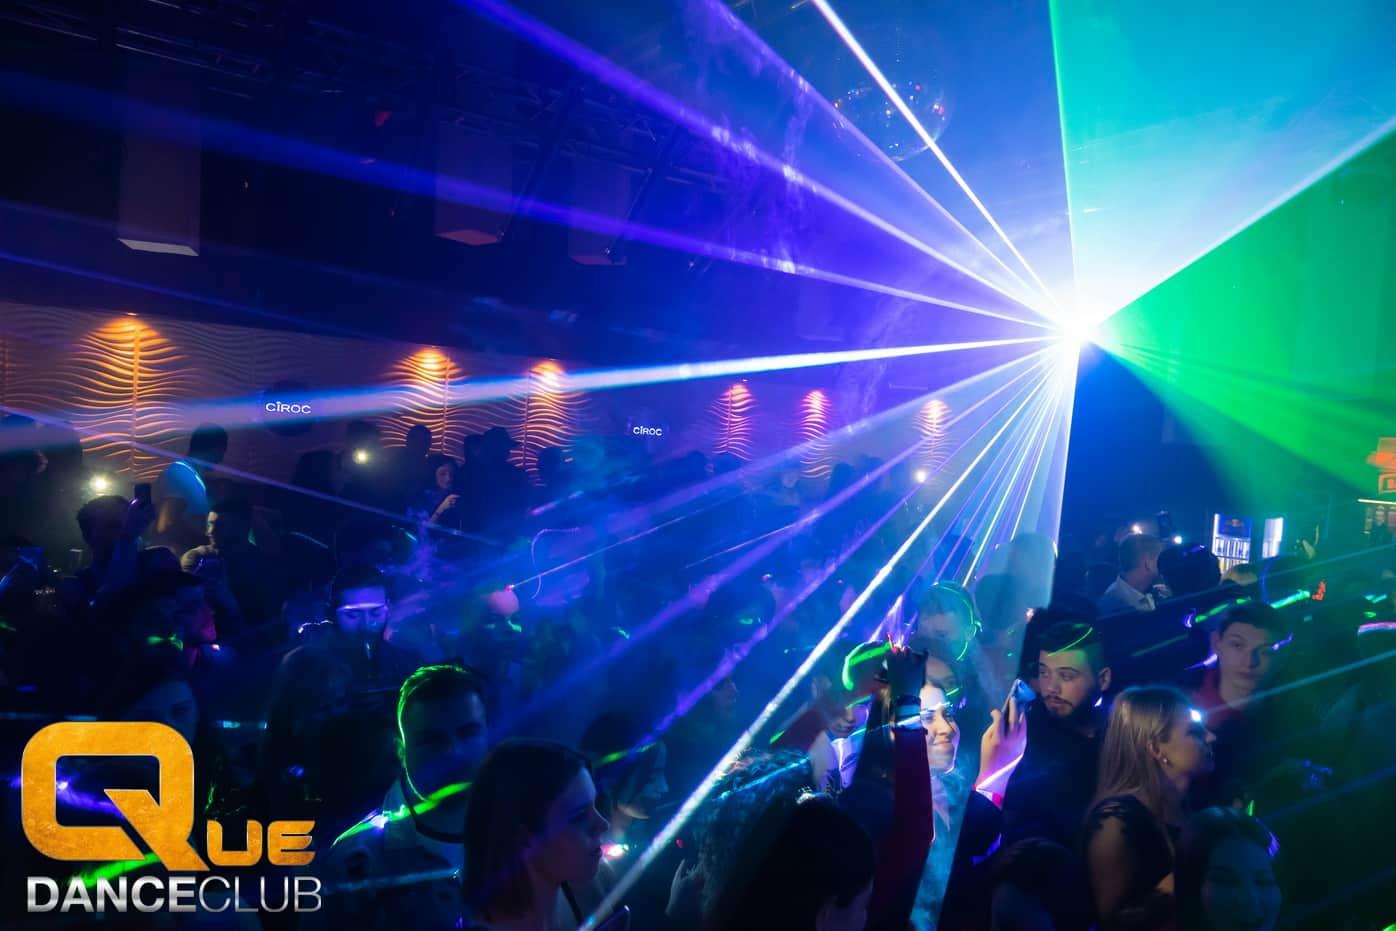 2018_12_08_Que_Danceclub_Paparazzo_Night_Ardian_Bujupi_Live_Nightlife_Scene_Timo_047